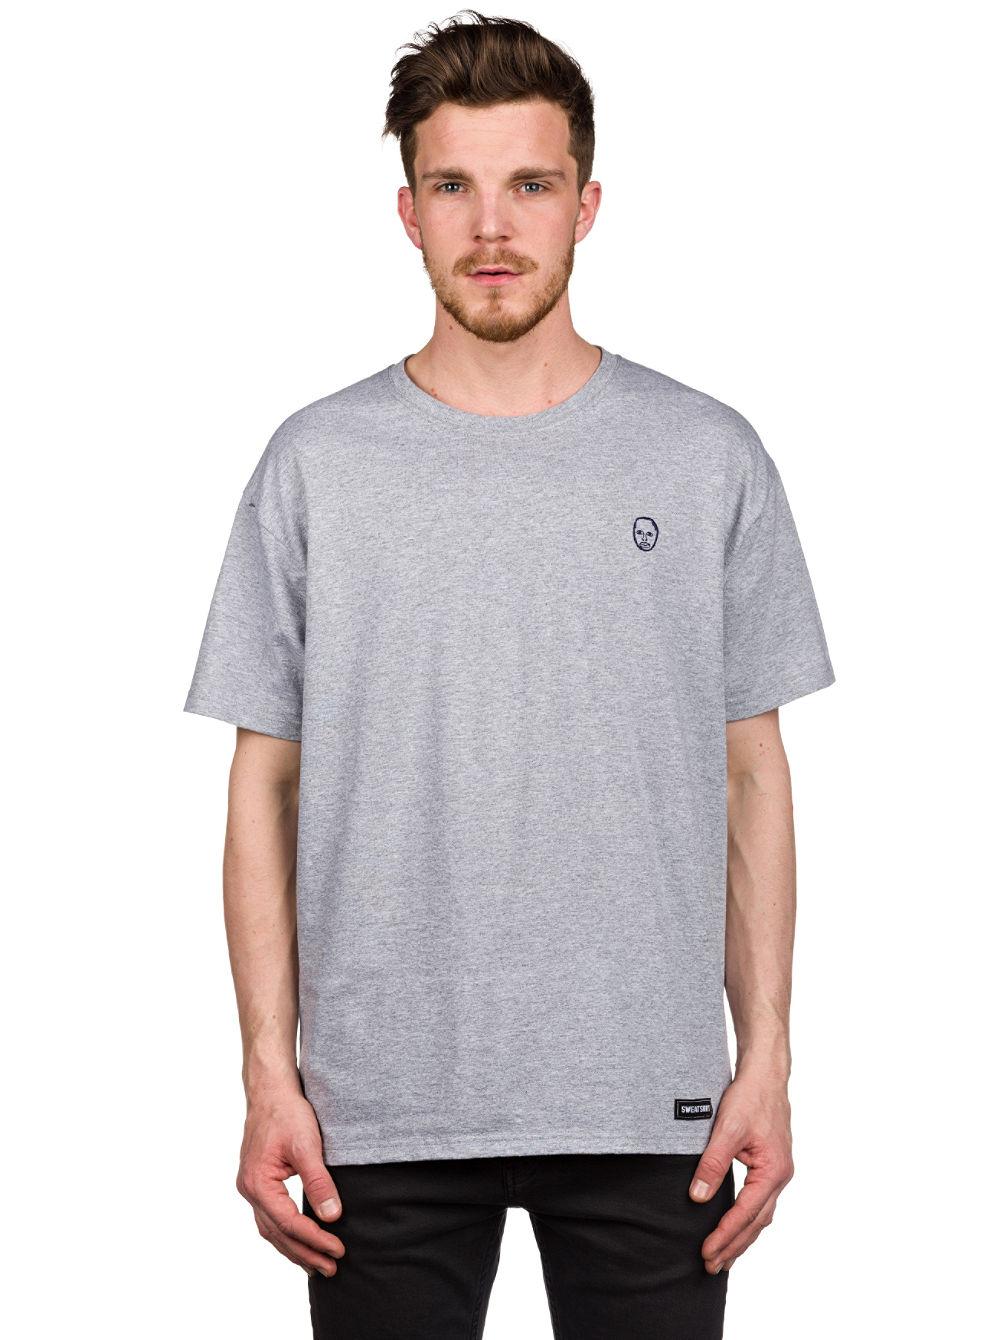 earl-sweatshirt-association-t-shirt